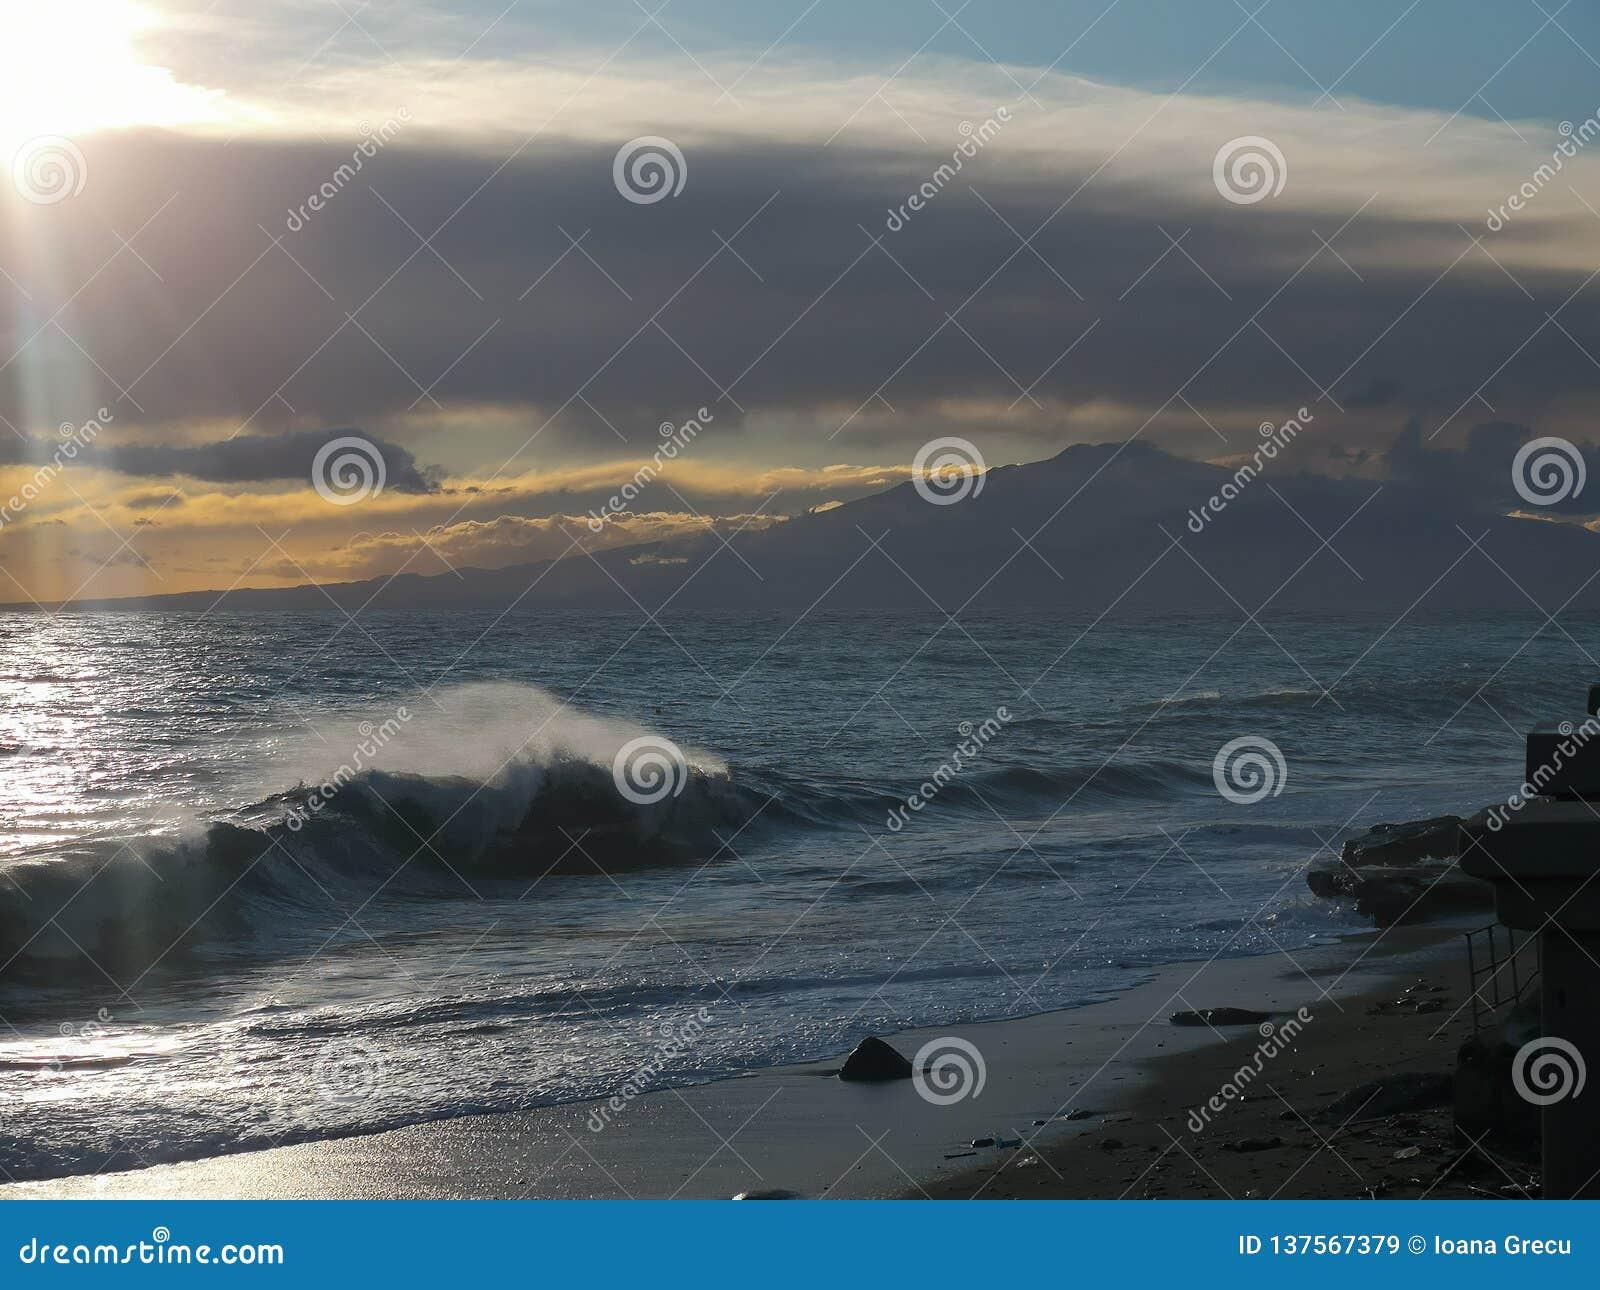 Mediterranean sea with mount Etna